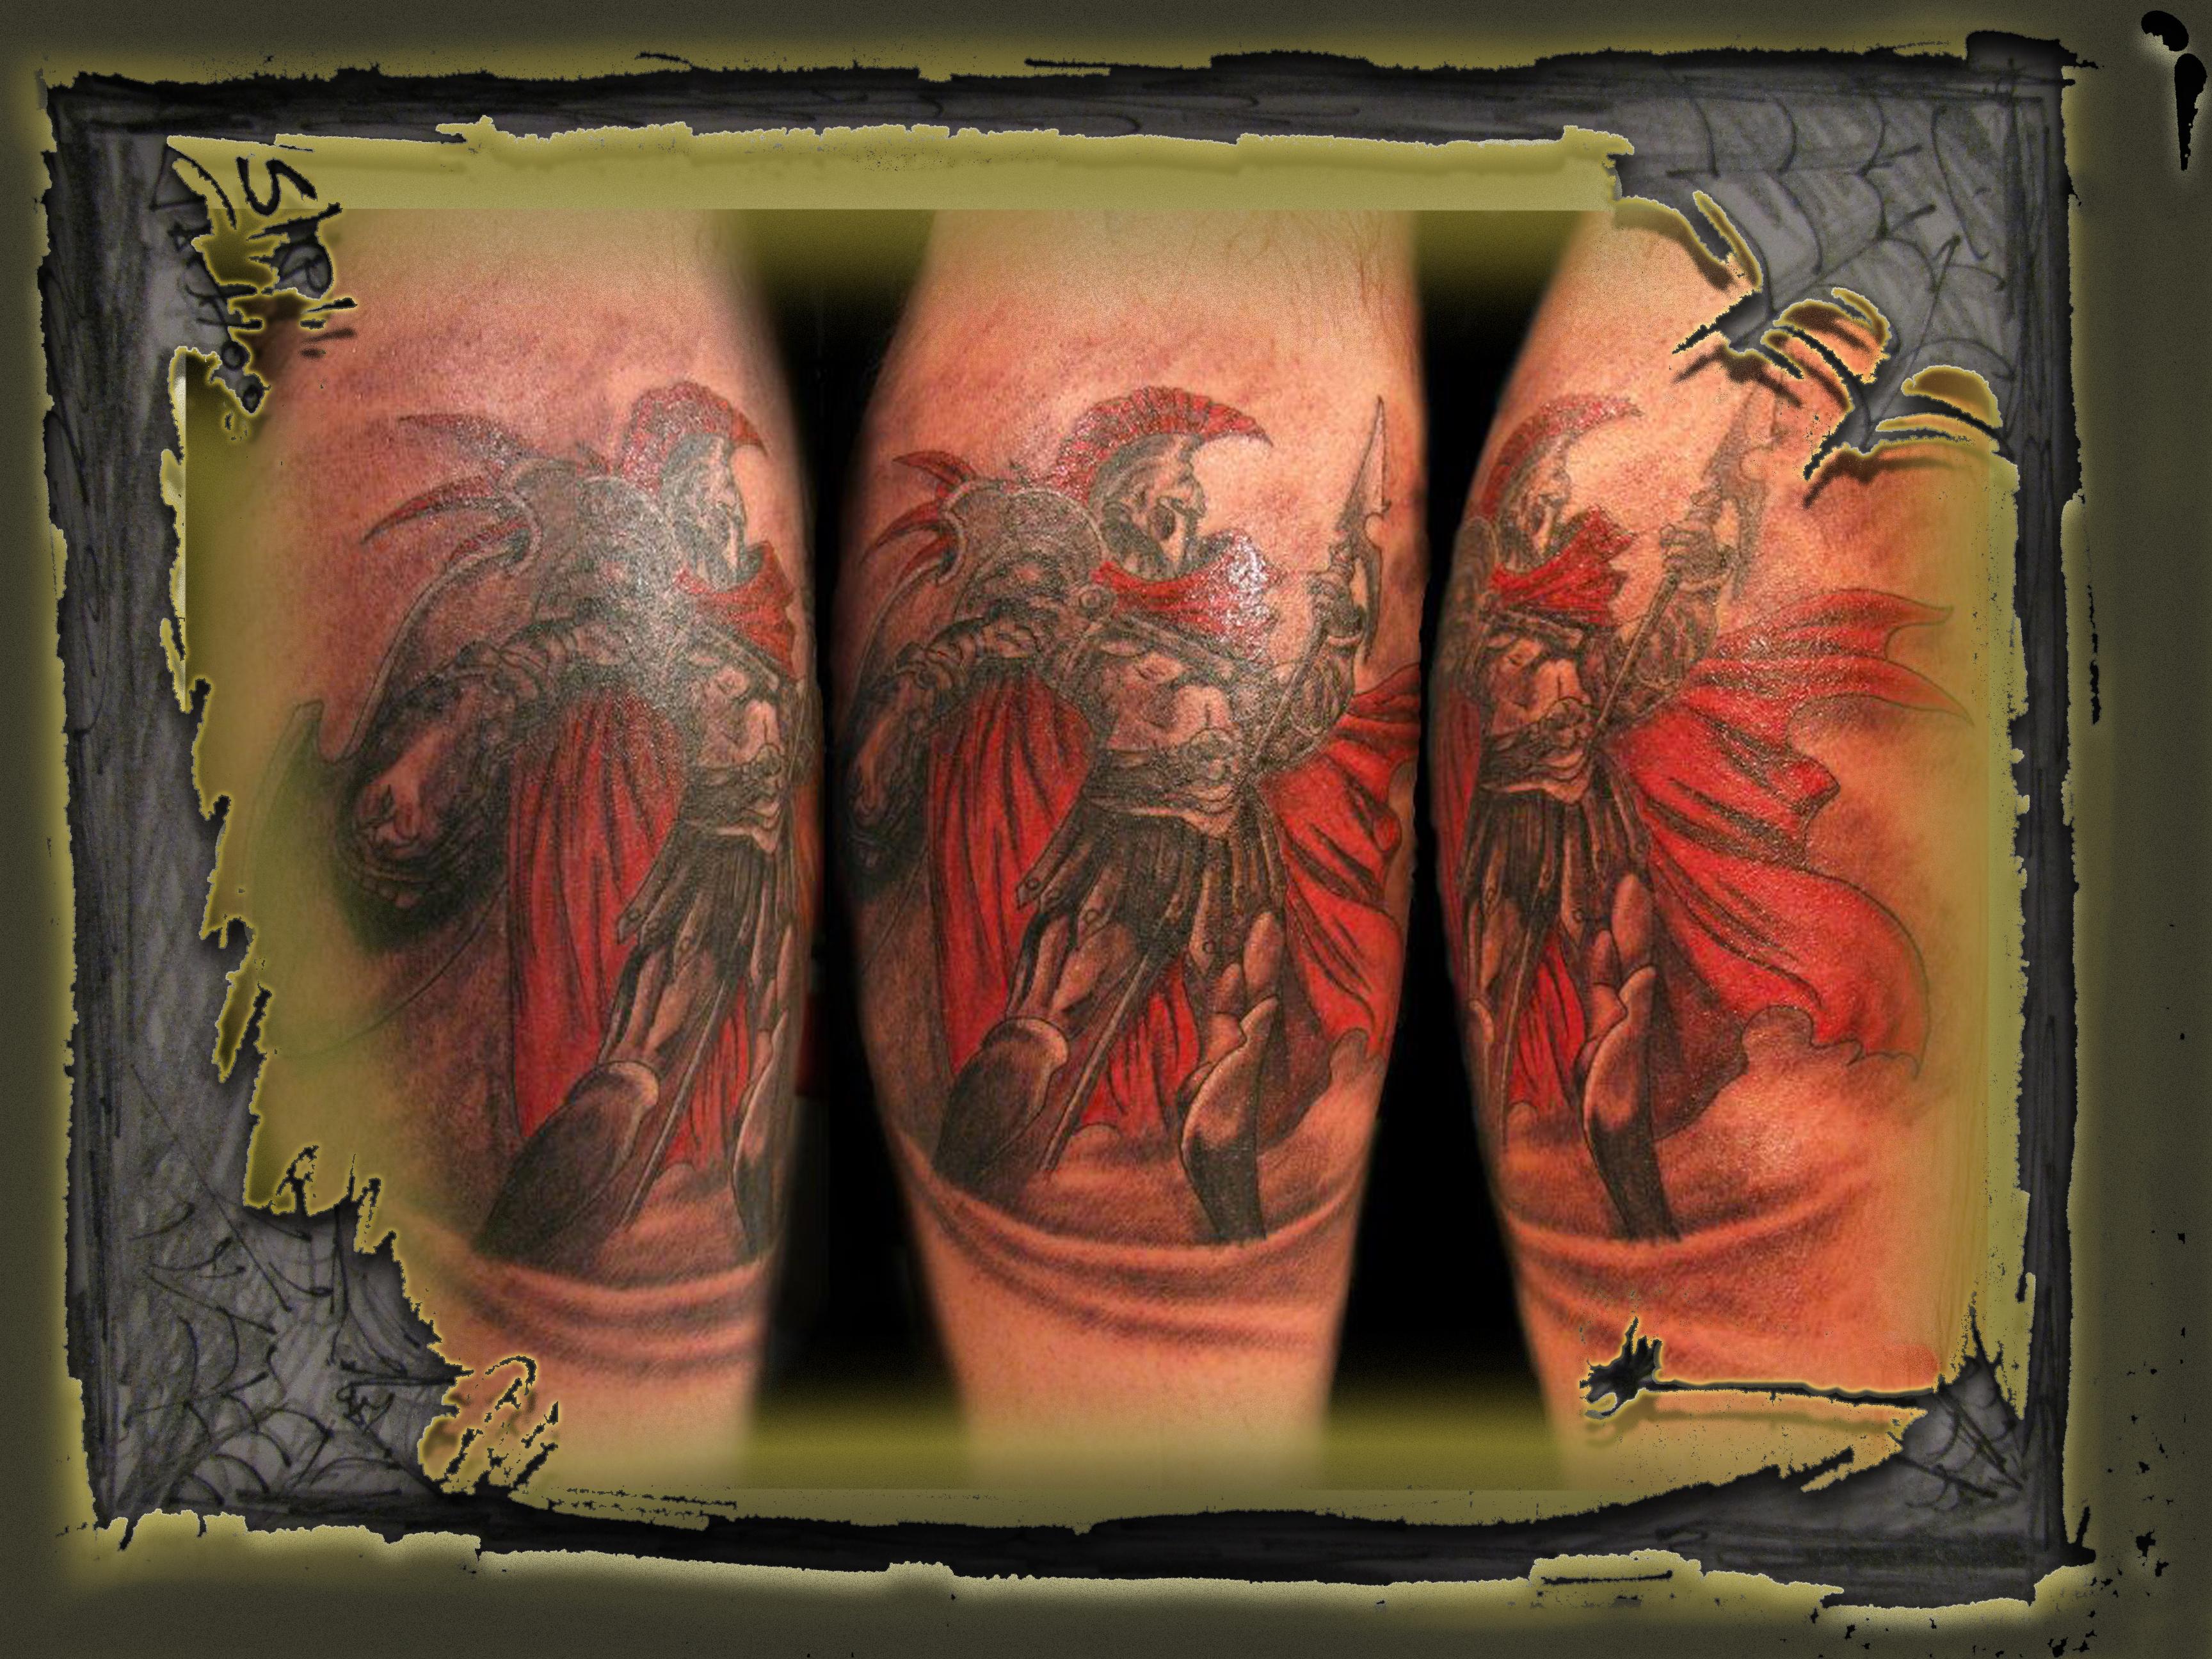 Ares God Of War By Slipitattoo On Deviantart